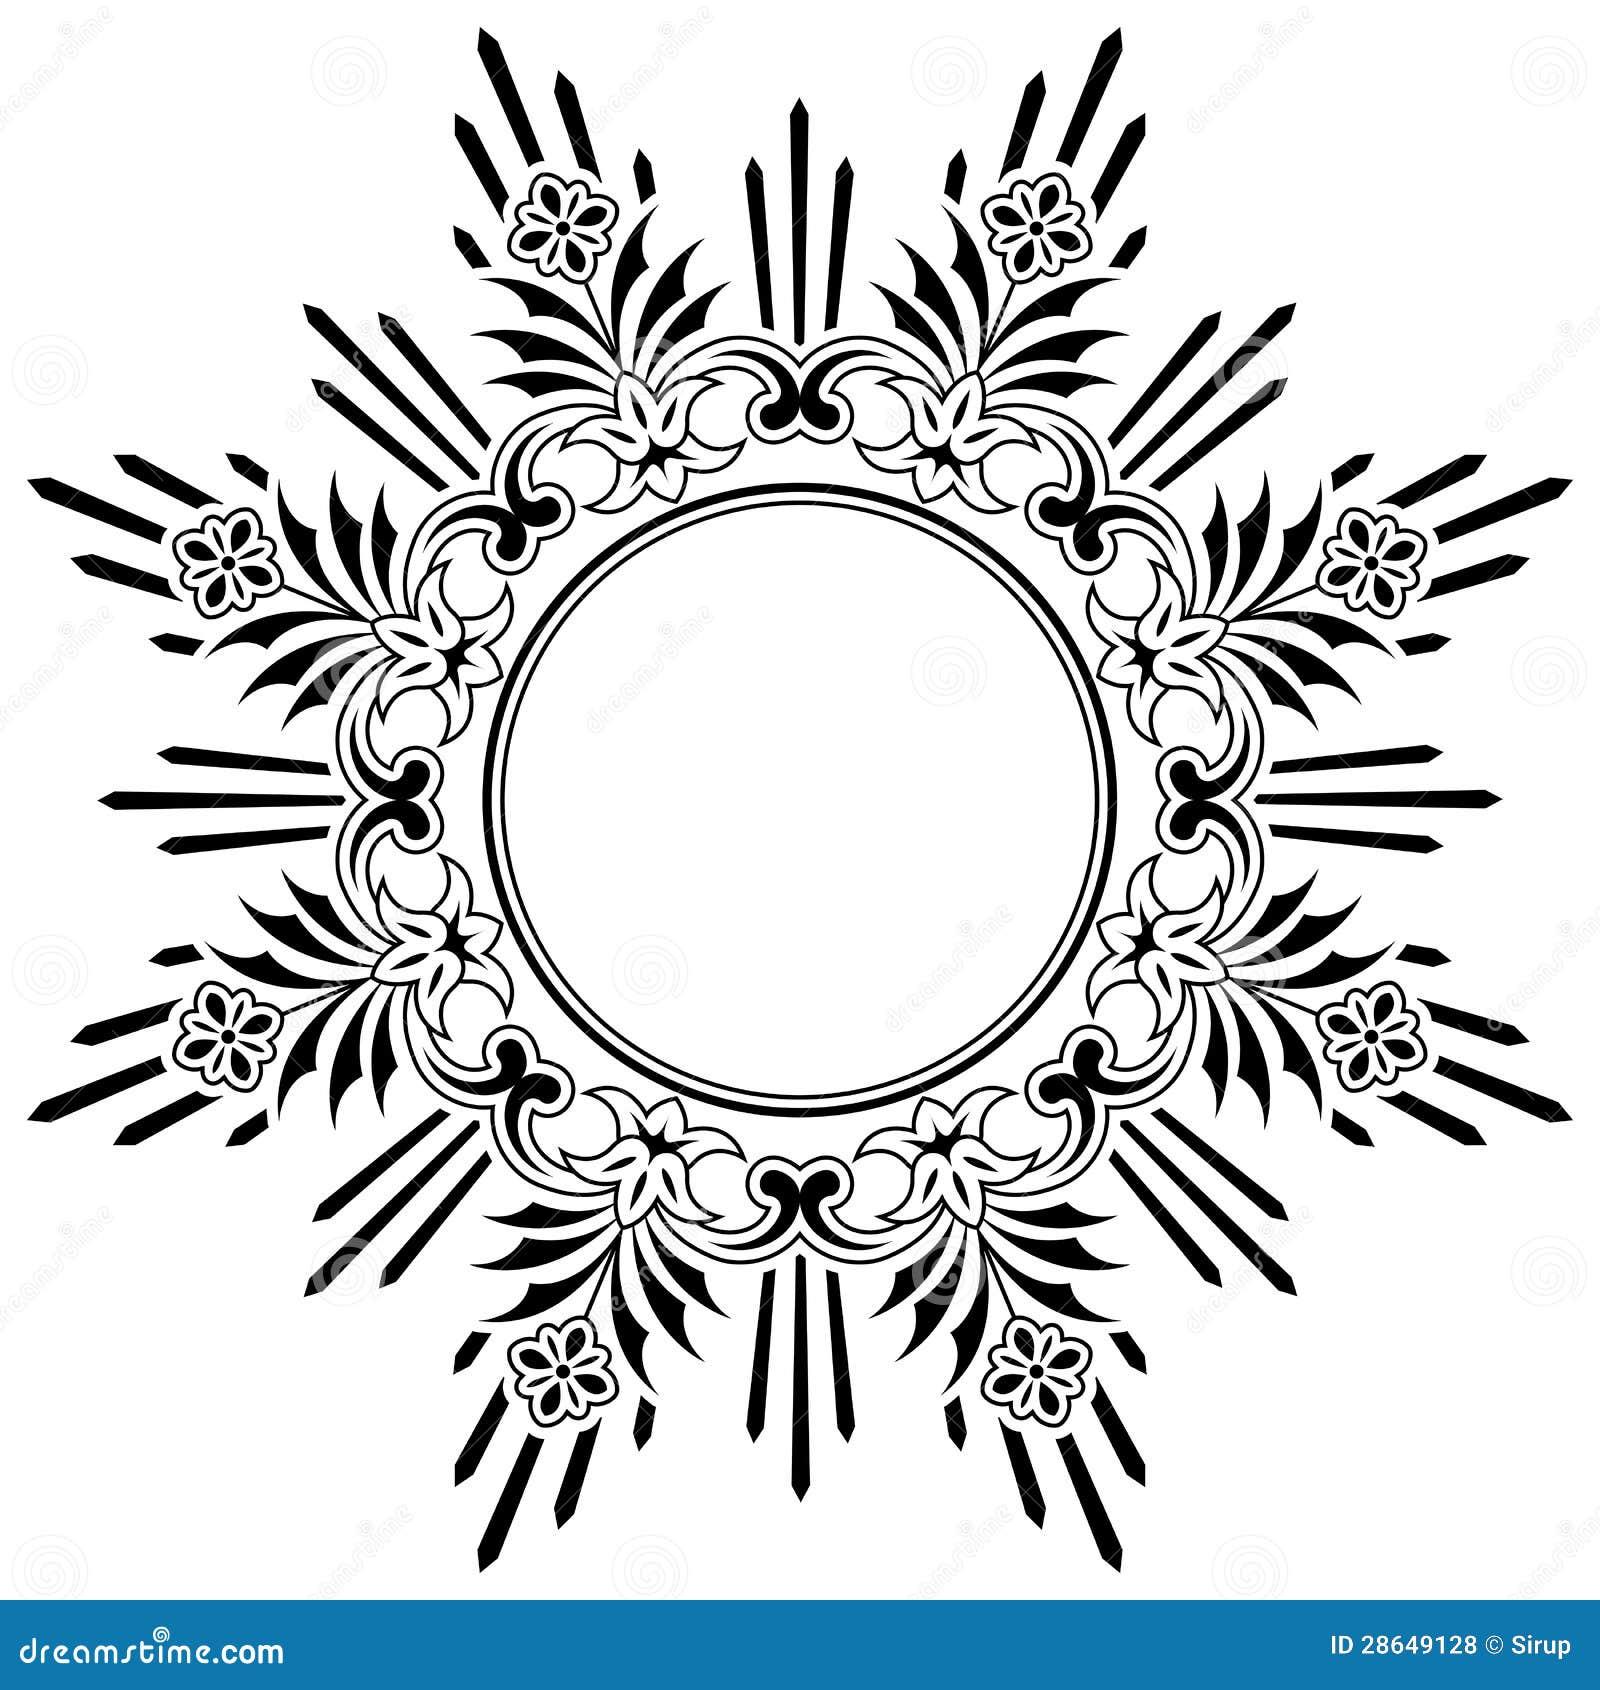 Round floral calligraphic border royalty free stock photos